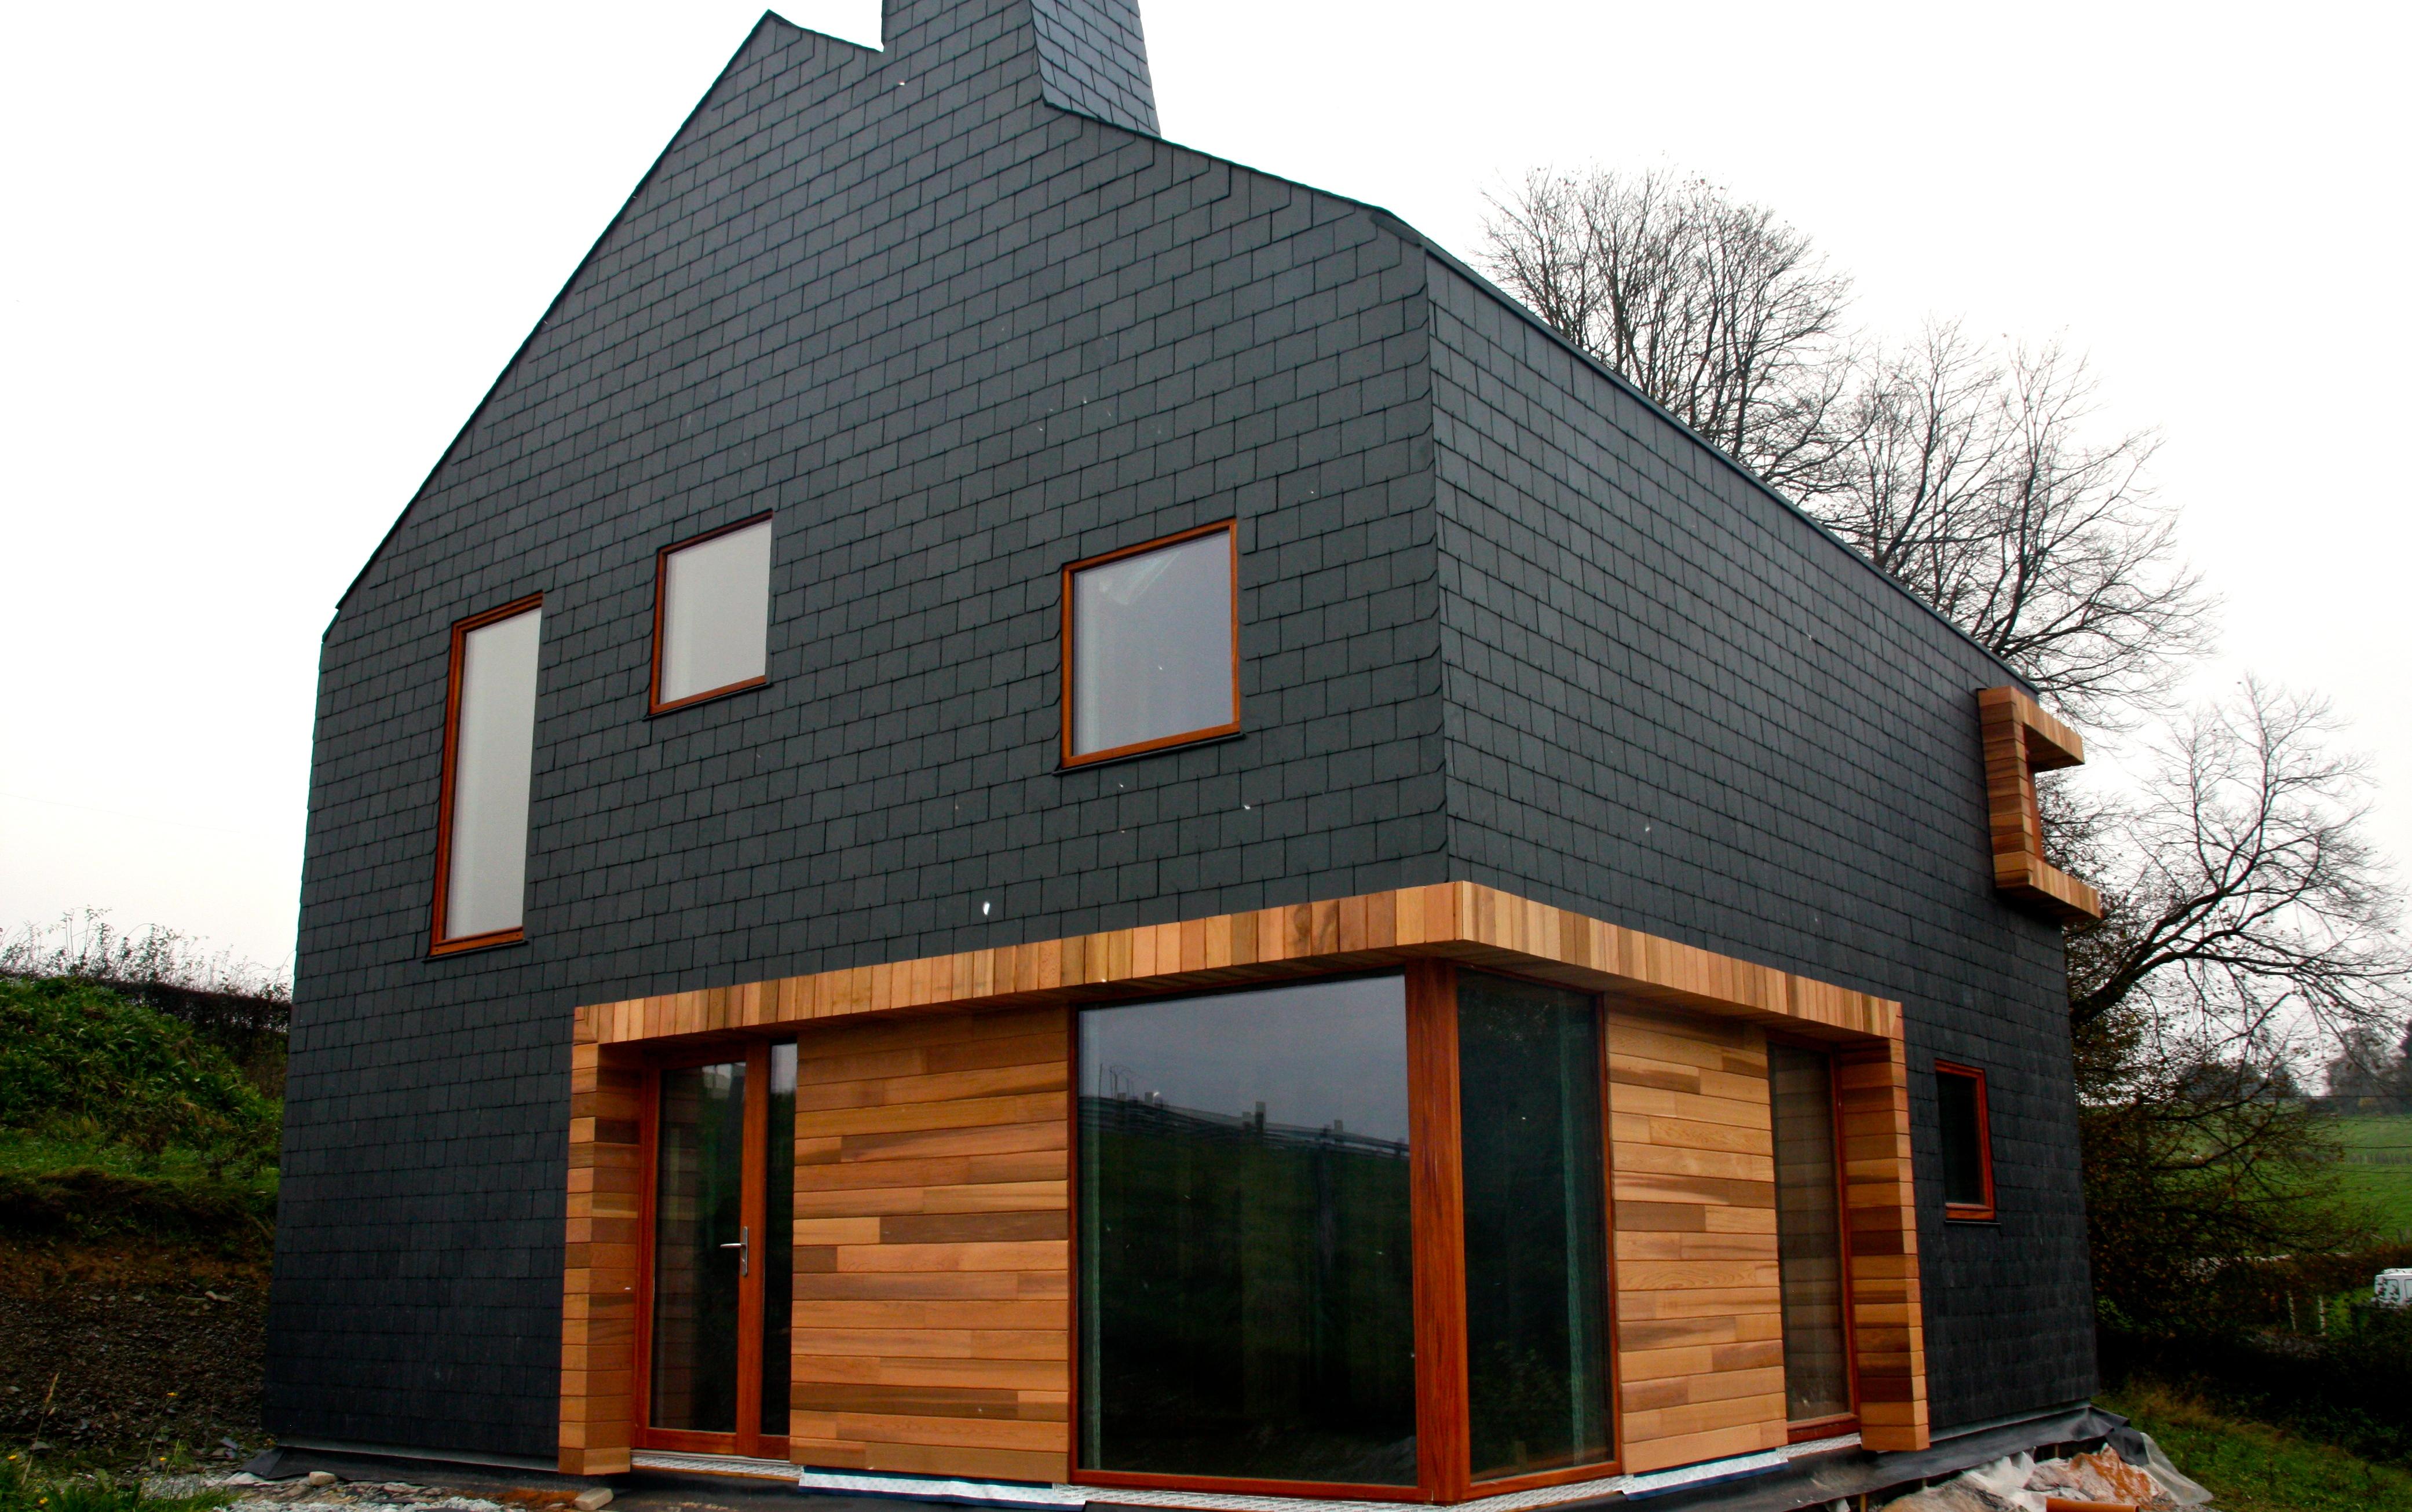 la maison basse nergie une d finition confuse. Black Bedroom Furniture Sets. Home Design Ideas